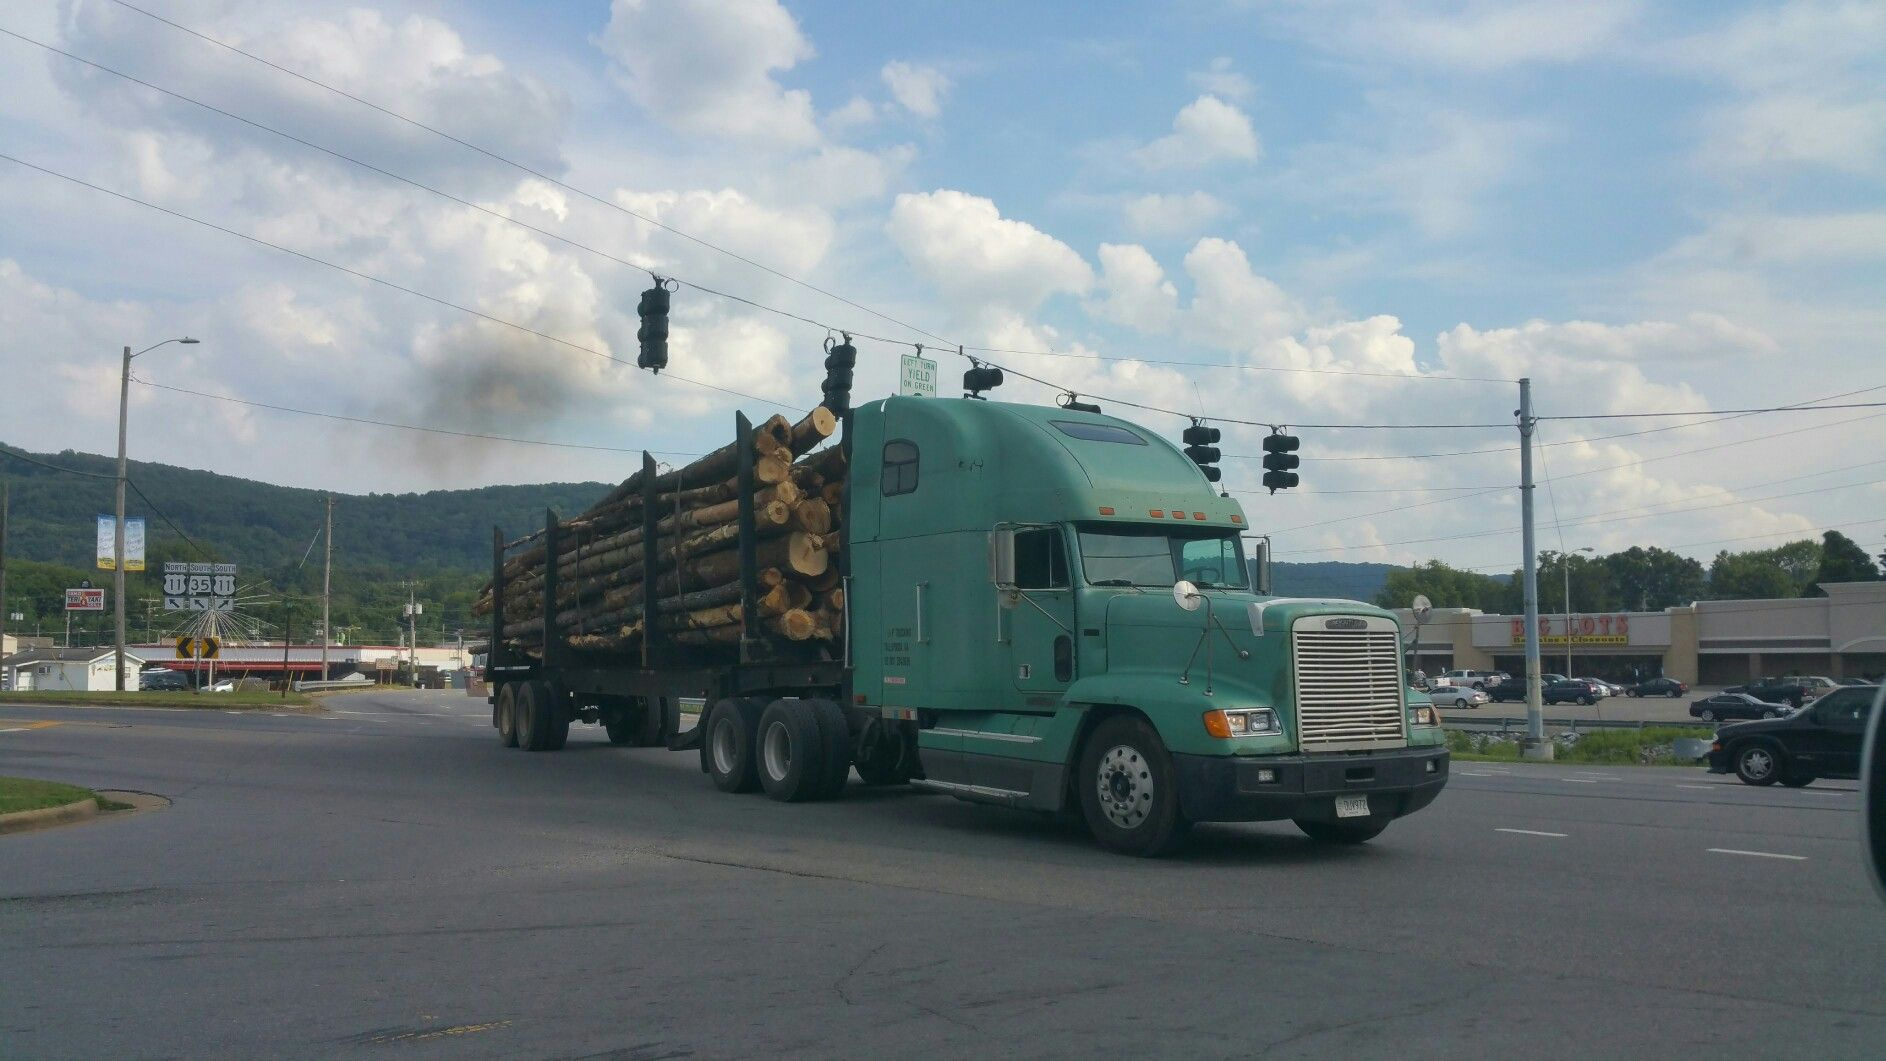 Logging Truck In Fort Payne Alabama Logger Trucker Trucking Freightliner Trucker Trucks Trucking Companies Freightliner